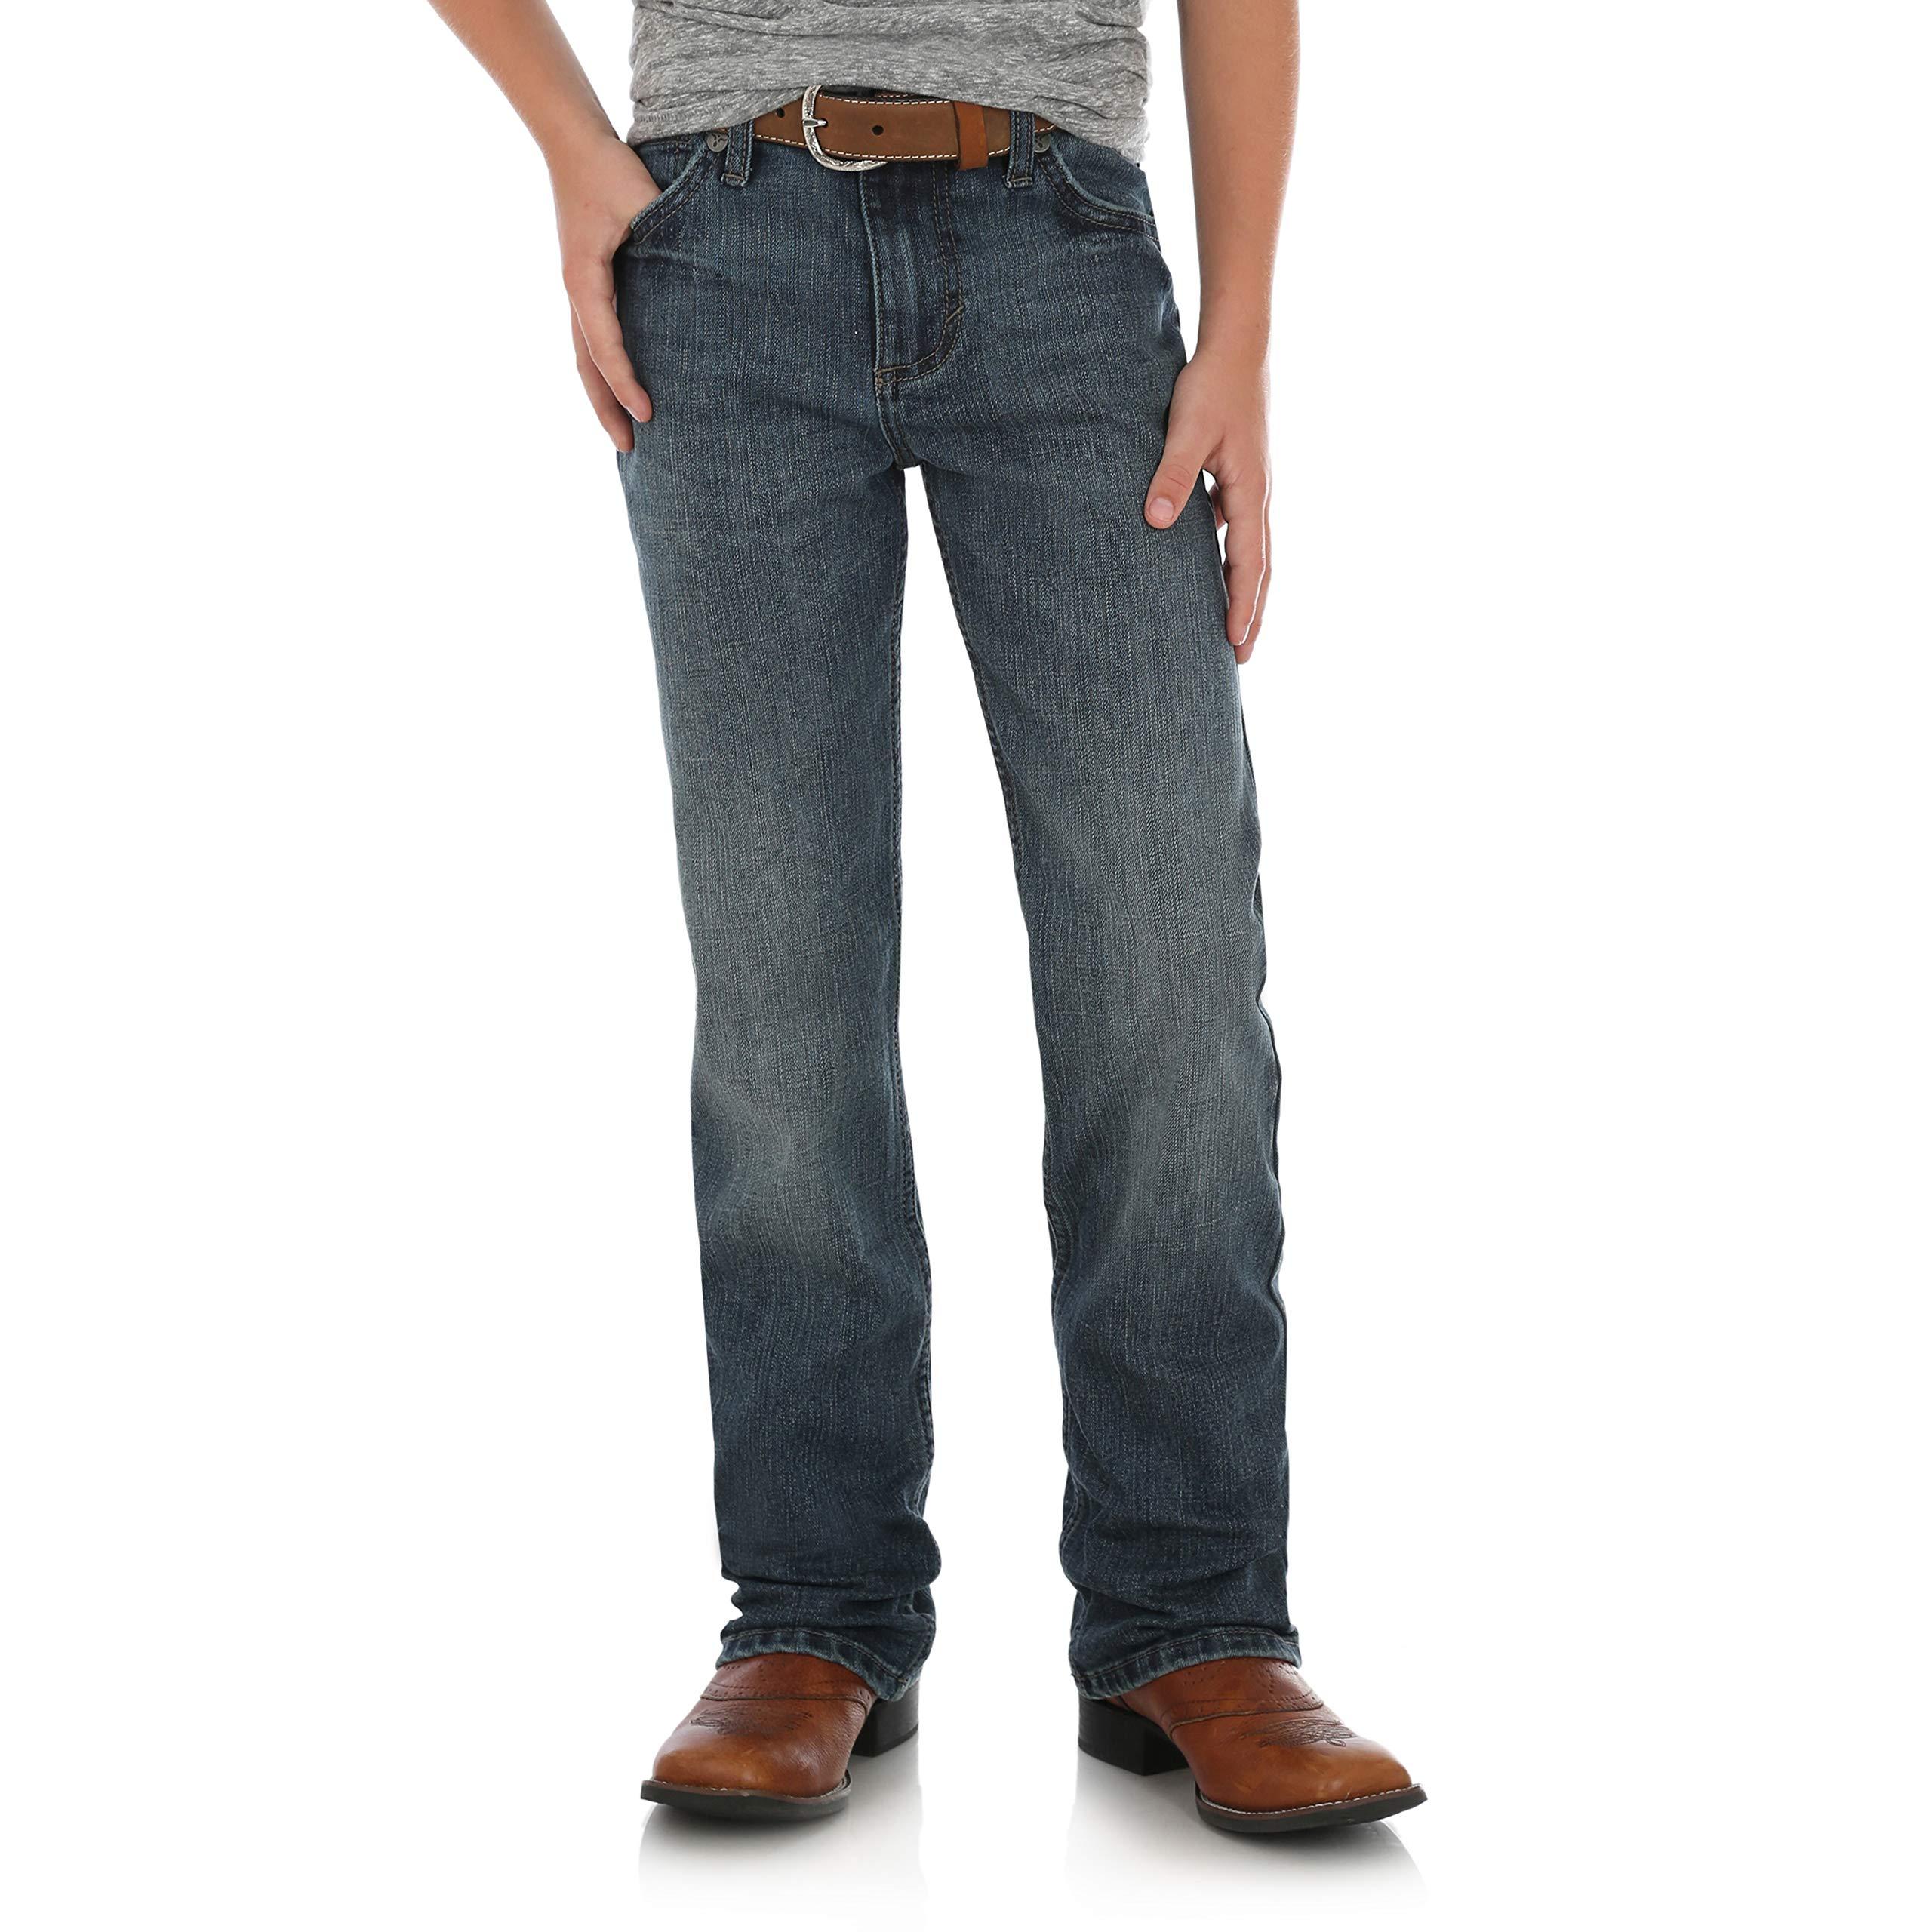 Wrangler Boys' 20x Slim Fit Straight Leg Jean